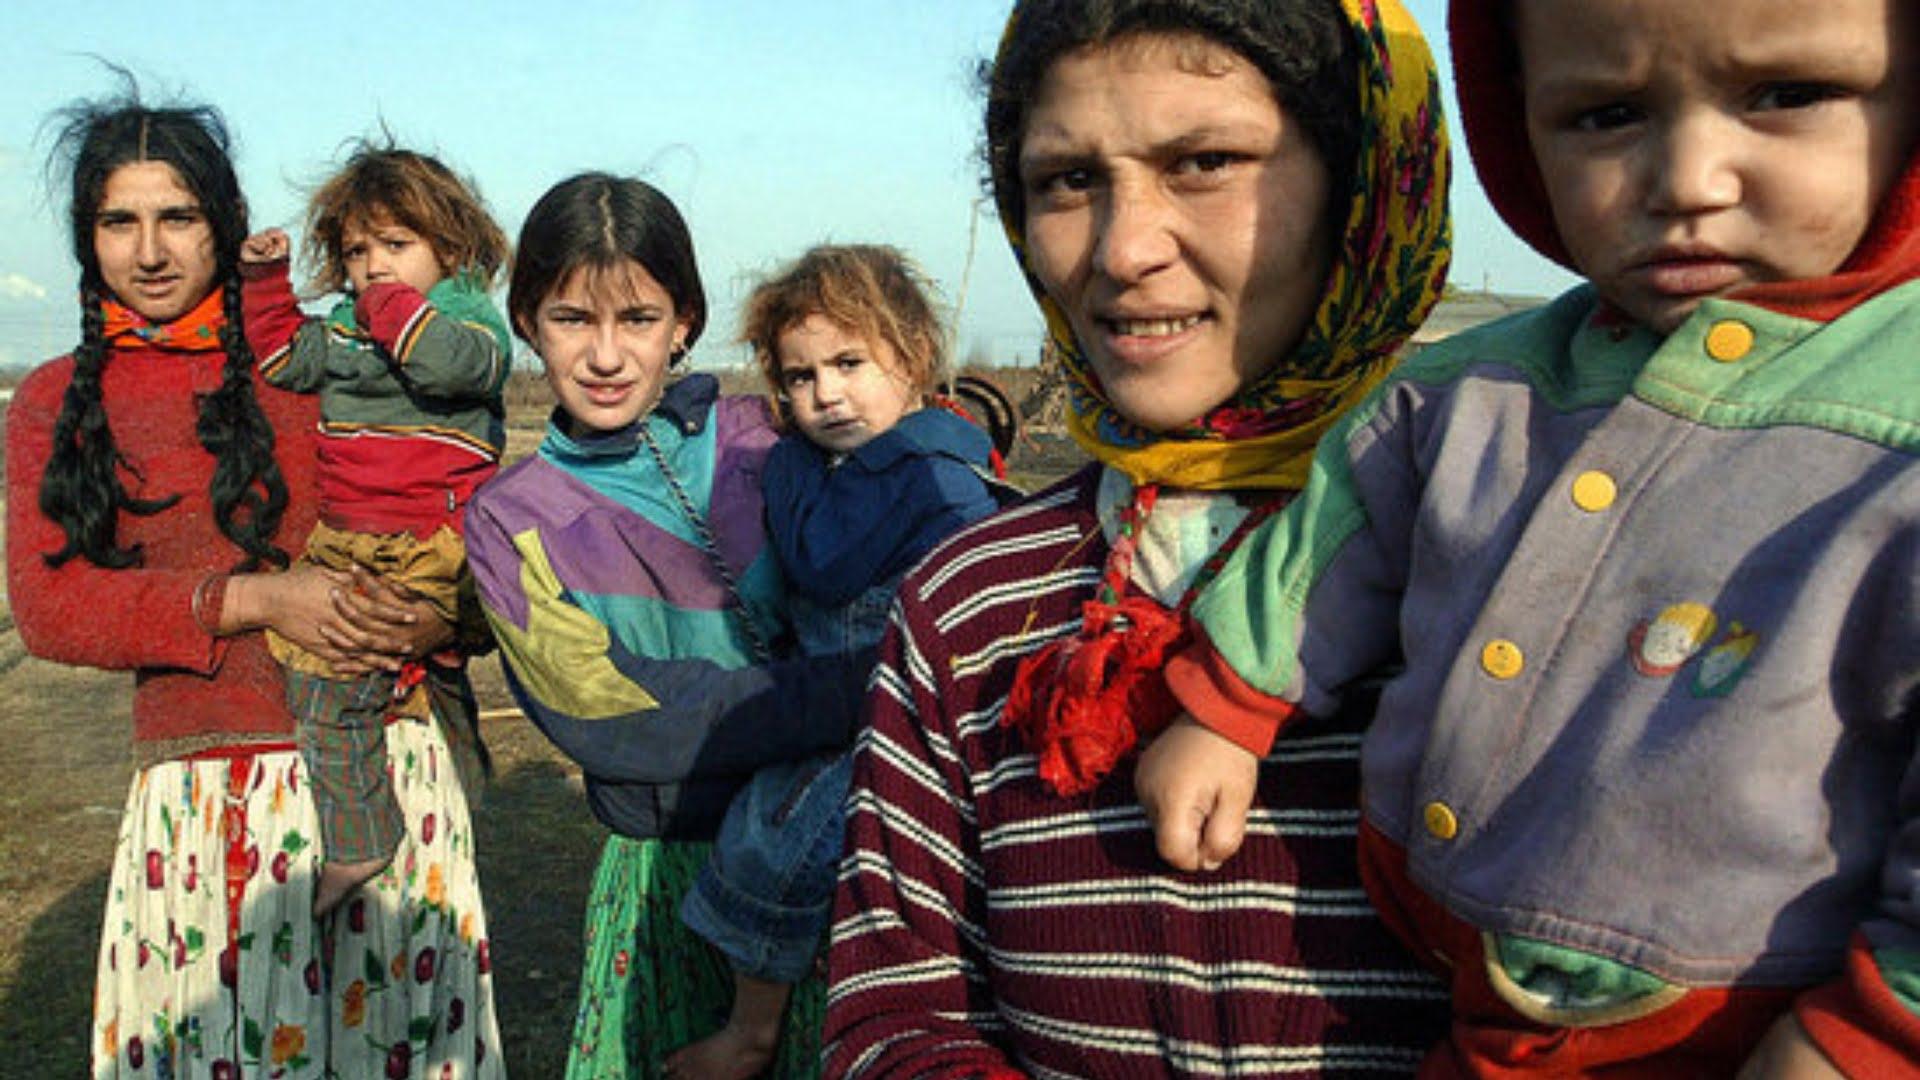 Dupa ce au facut ravagii in Europa, romii au invins si Suedia! Statul suedez le da cate 3300 de euro de persoana!